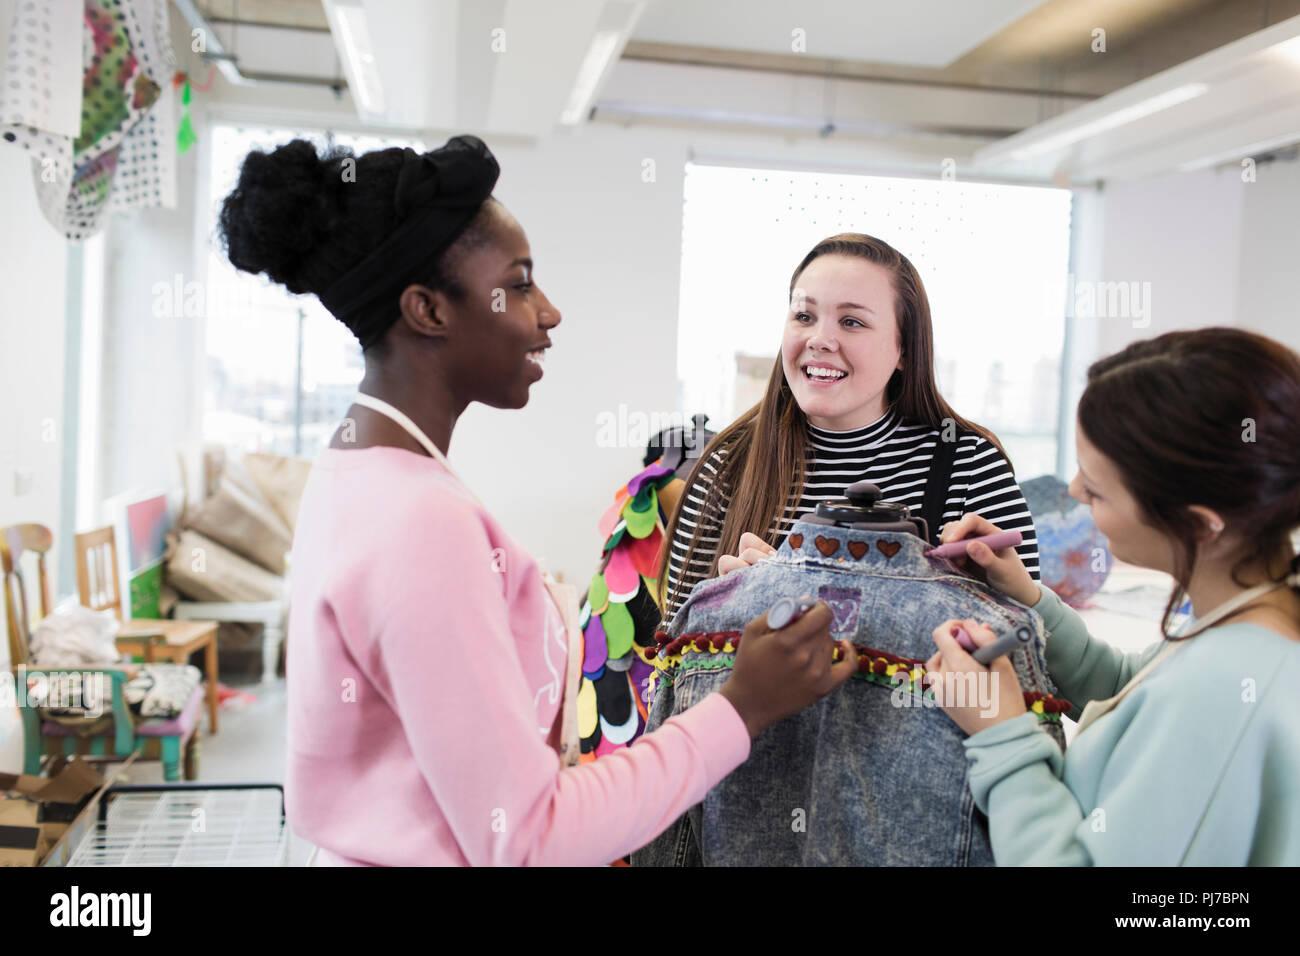 Teenage Girls Designing Denim Jacket In Fashion Design Class Stock Photo Alamy